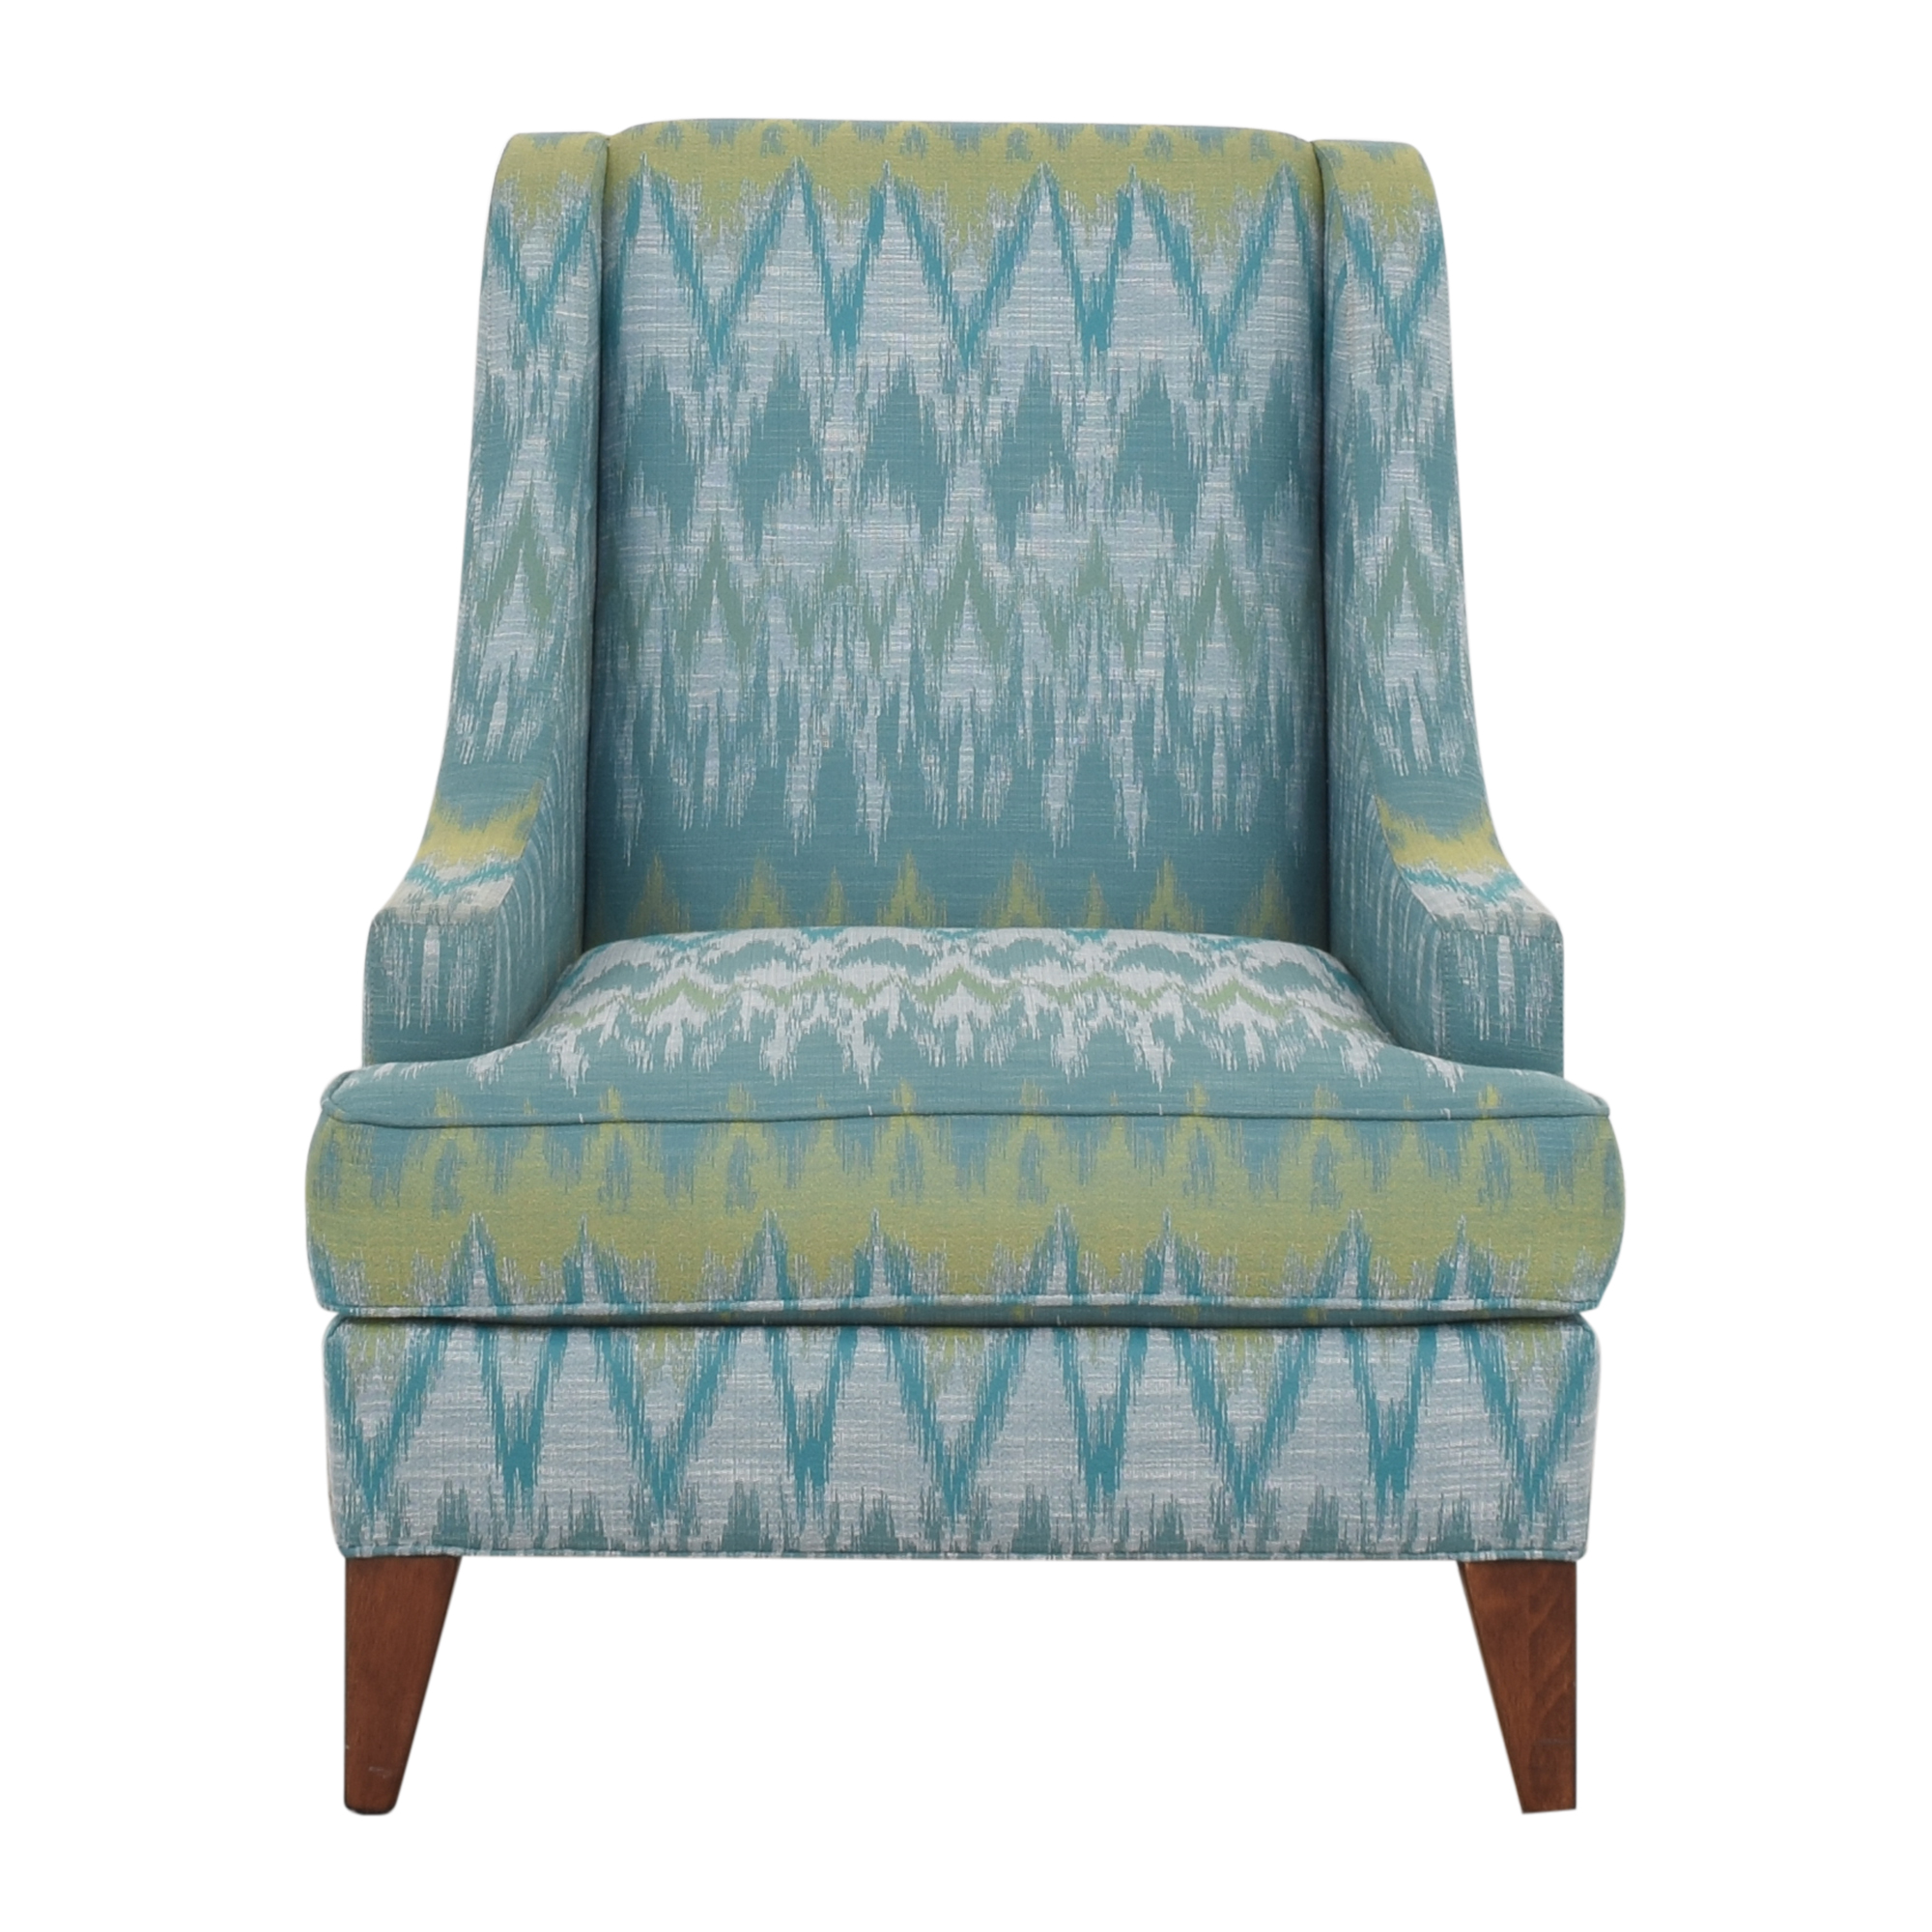 Ethan Allen Ethan Allen Emerson Chair ct